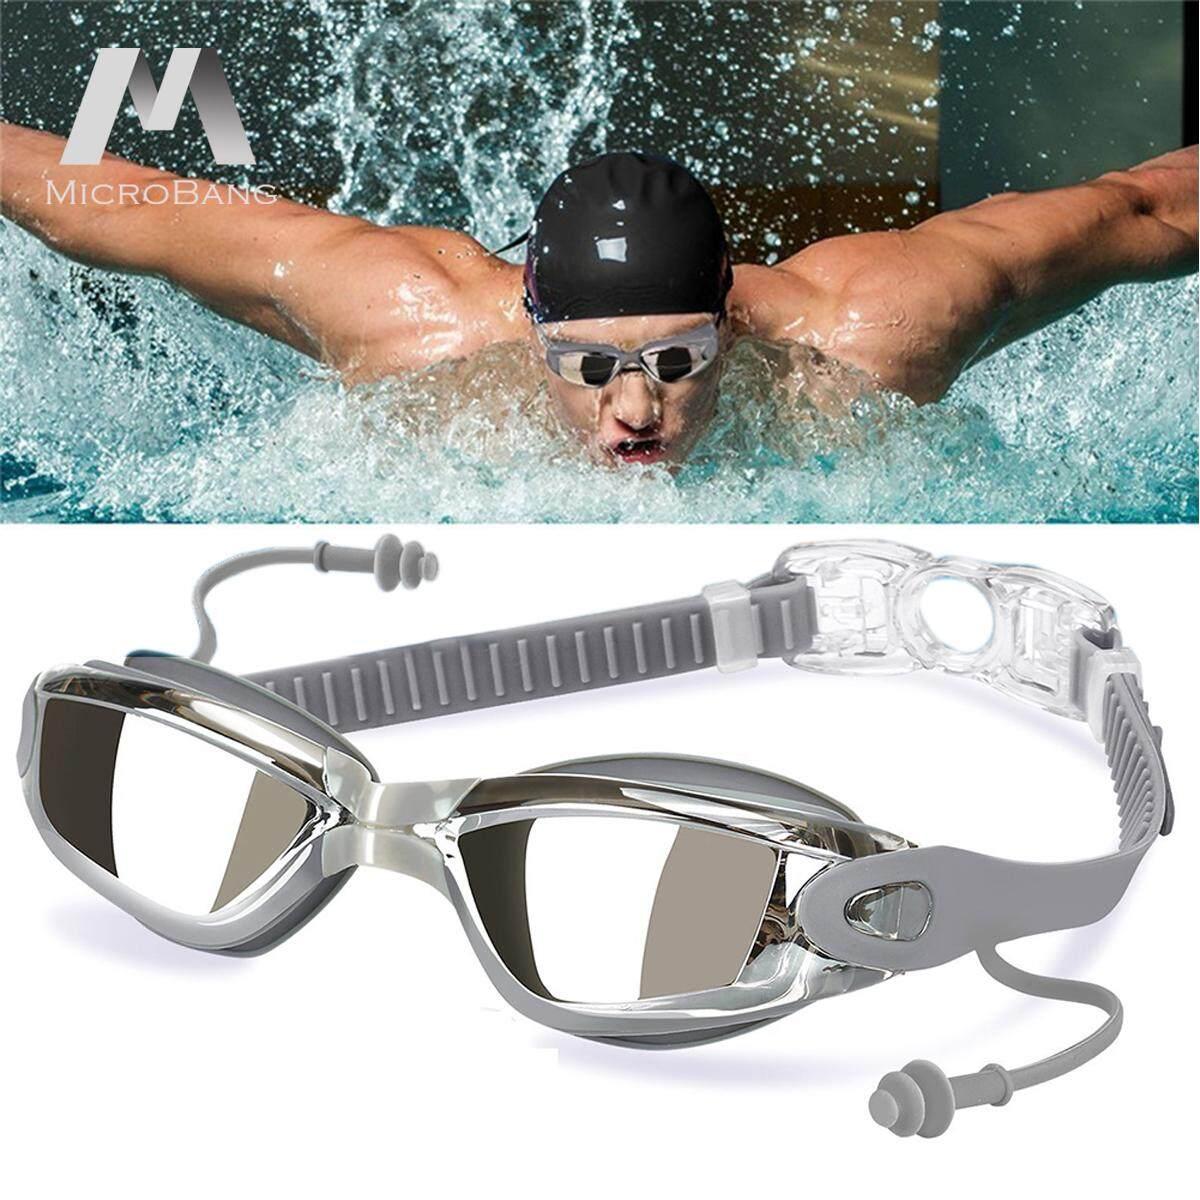 1cf4685bb9d China. MicroBang Swim Goggles, Swimming Goggles for Adult Men Women Youth  Kids Child, Triathlon Equipment